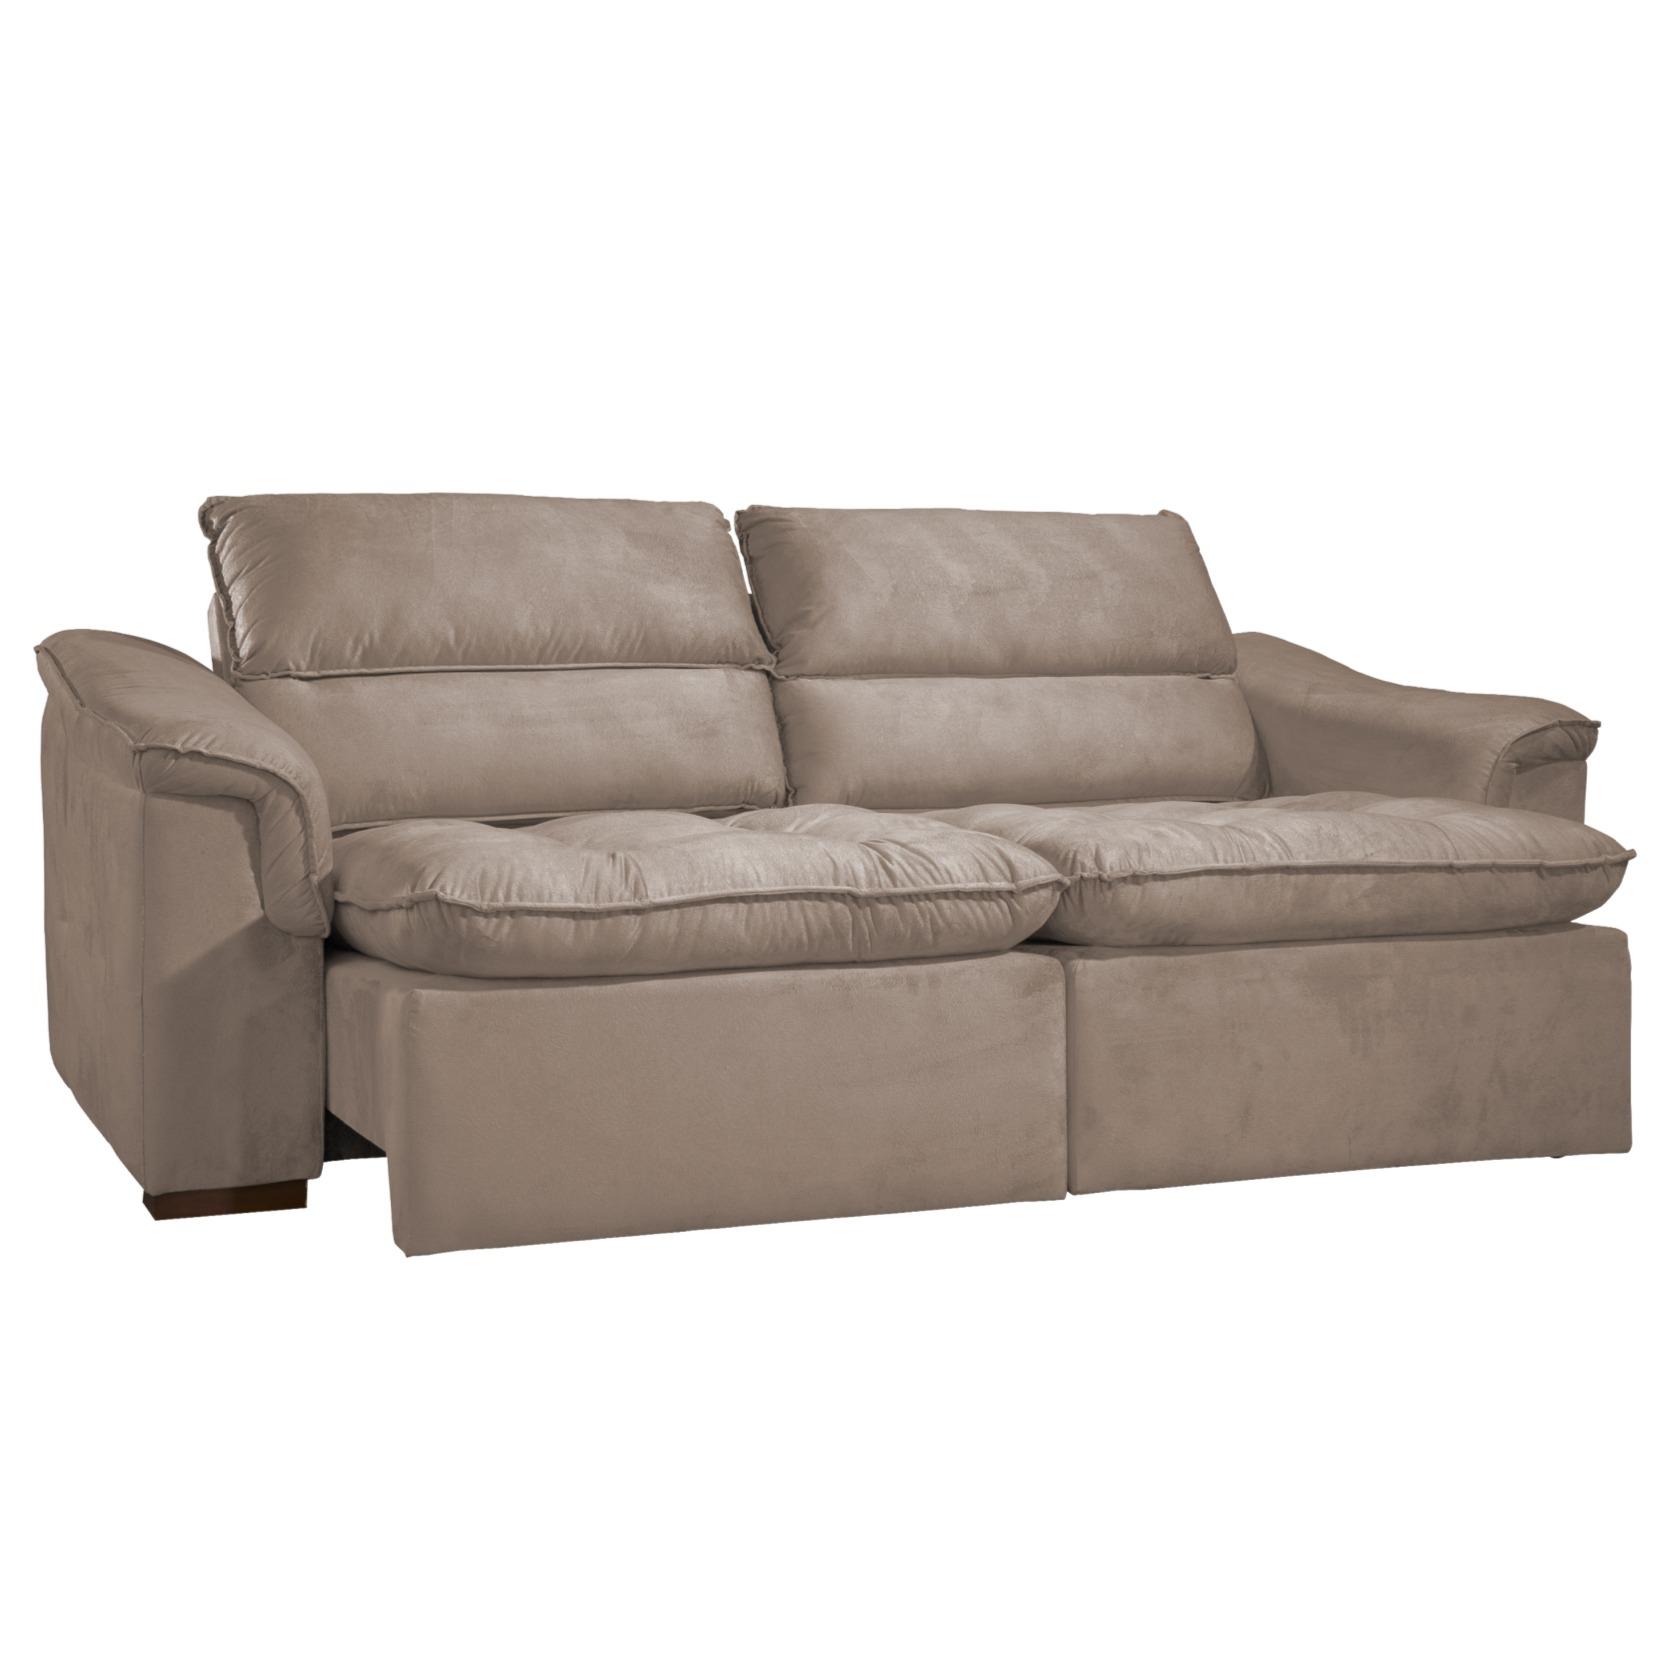 Sofa 4 Lugares Retratil Reclinavel Spazzio Bege 236 cm